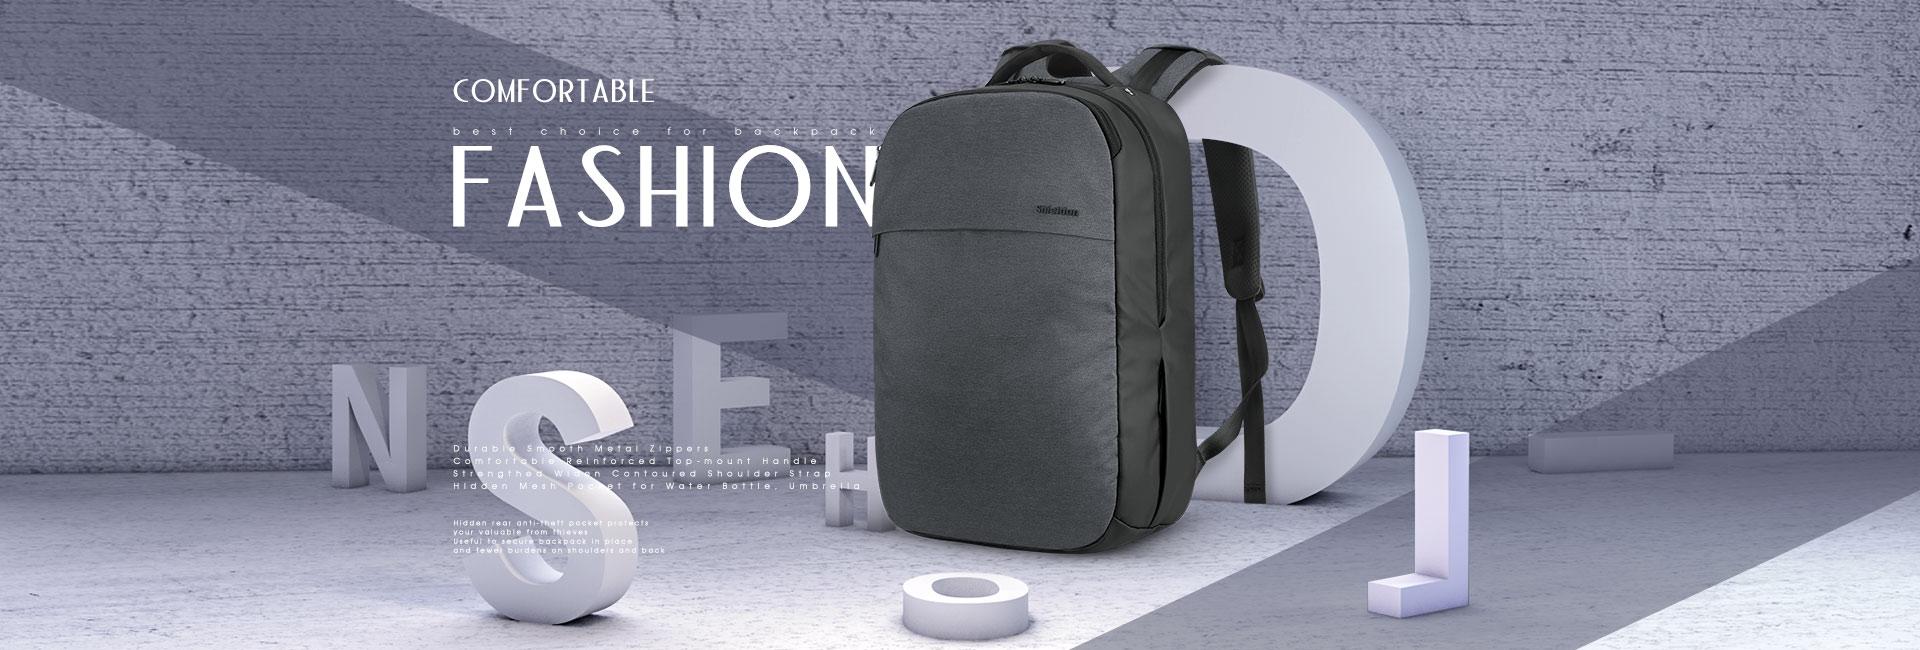 SHIELDON Rucksack Damen Herren Rucksäcke Laptop 15.6 Zoll, Business Backpack Reiserucksack für Studenten Mädchen Kinder